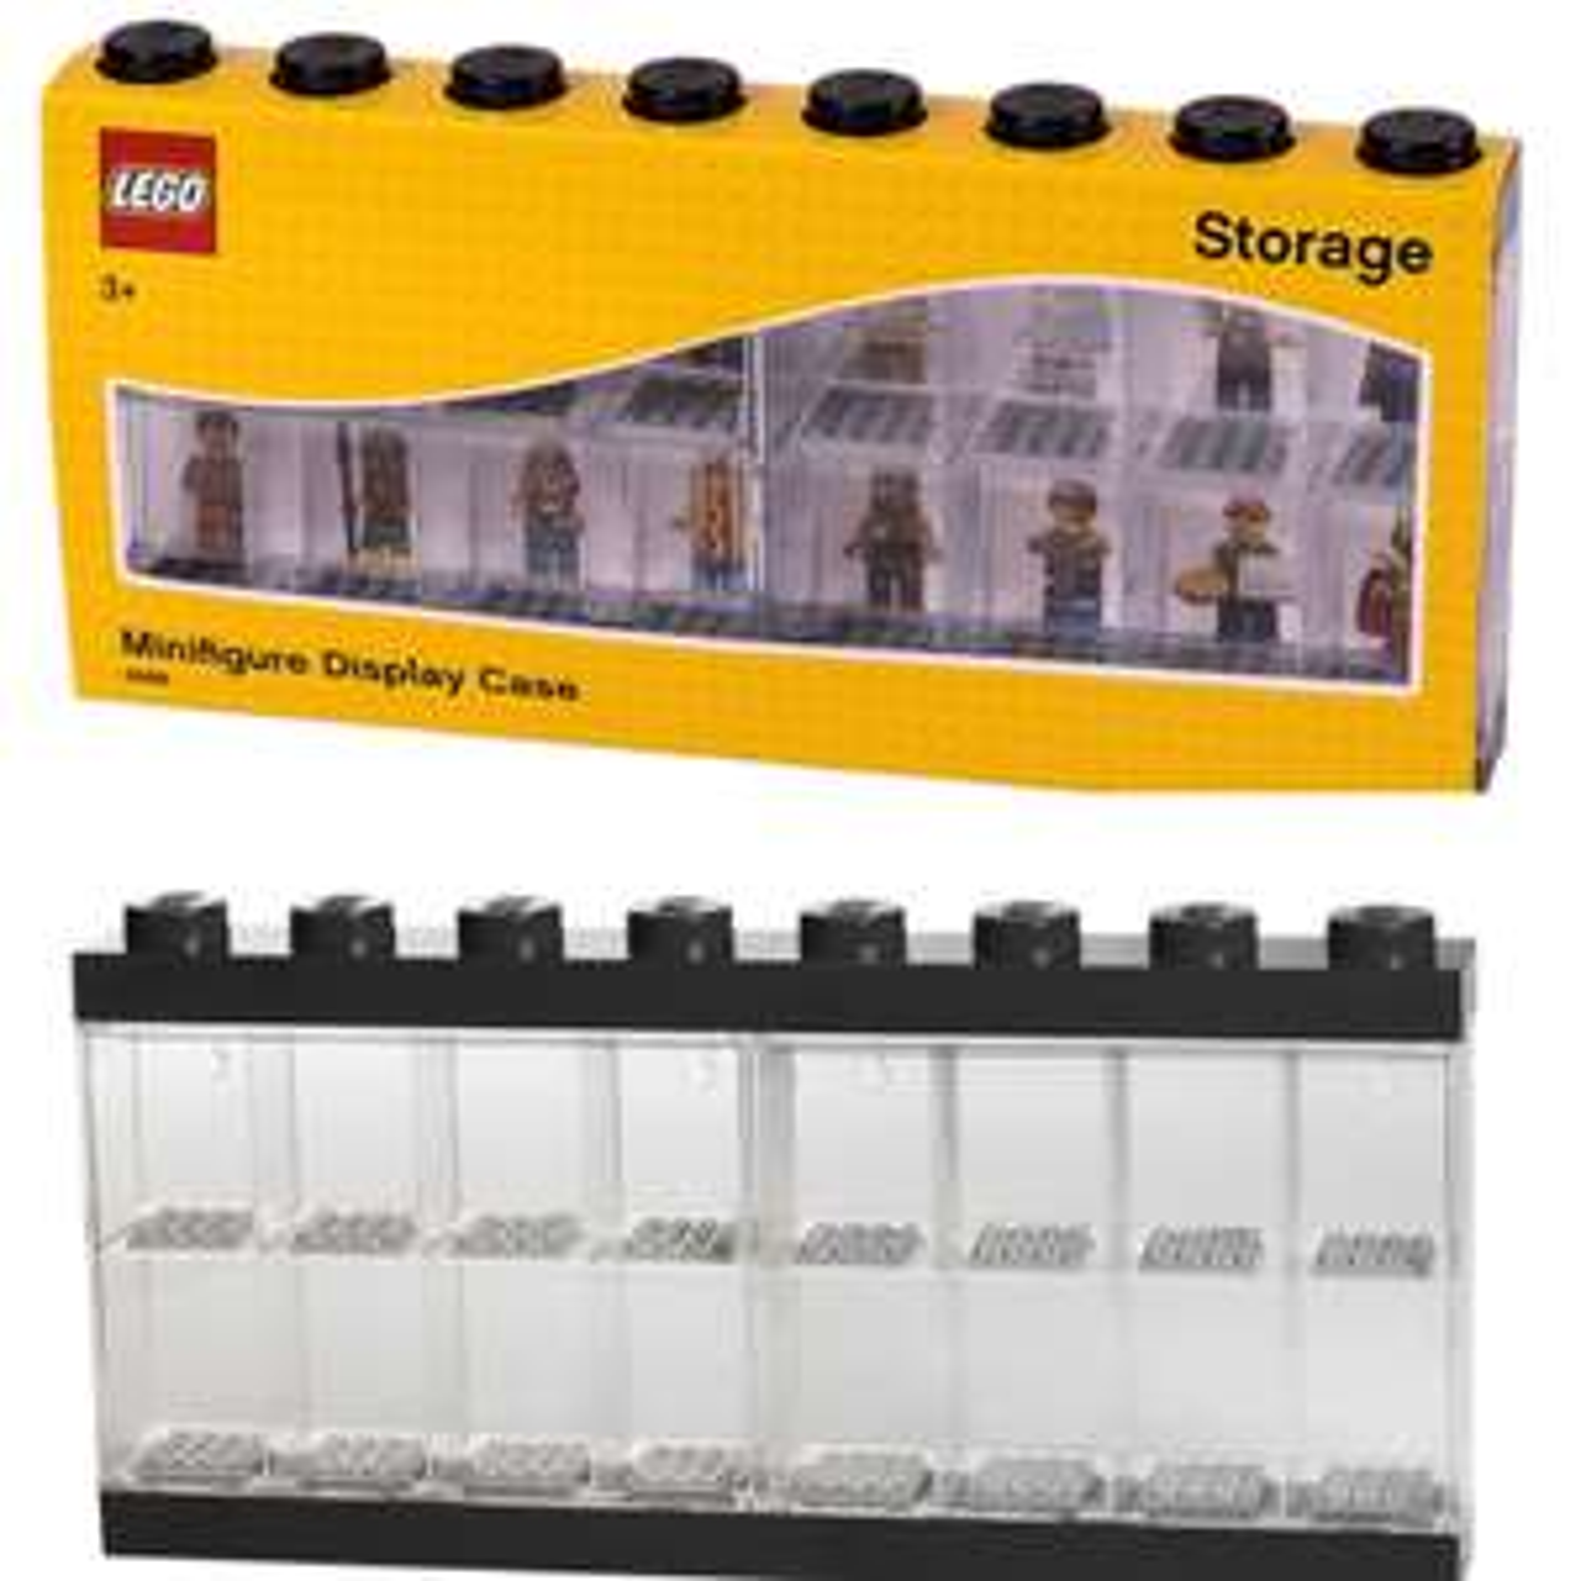 LEGO® 40660003 Minifiguren Display Case in schwarz & grau für 16 Figuren bei JB- Spielwaren (lokal Oberhausen)